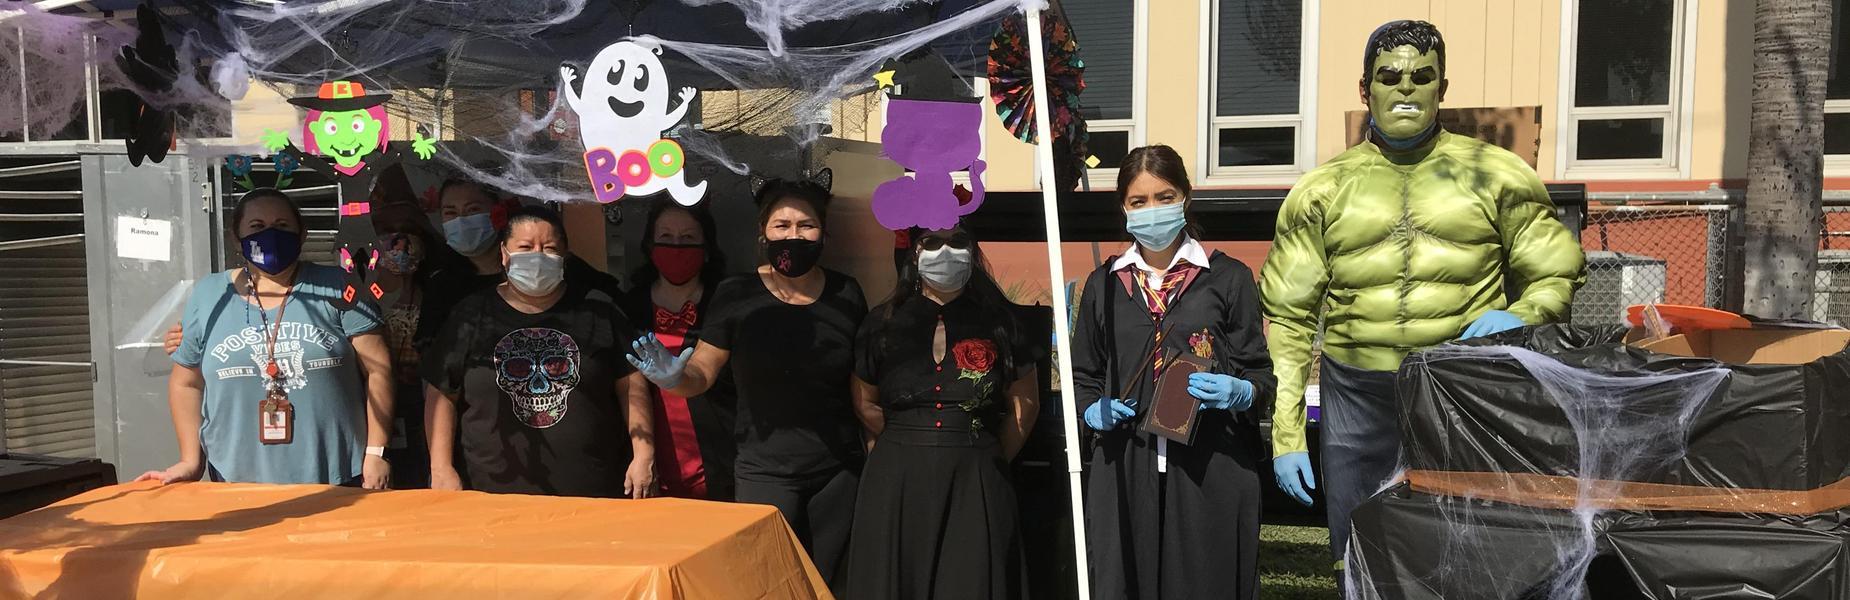 Ramona Staff during Halloween